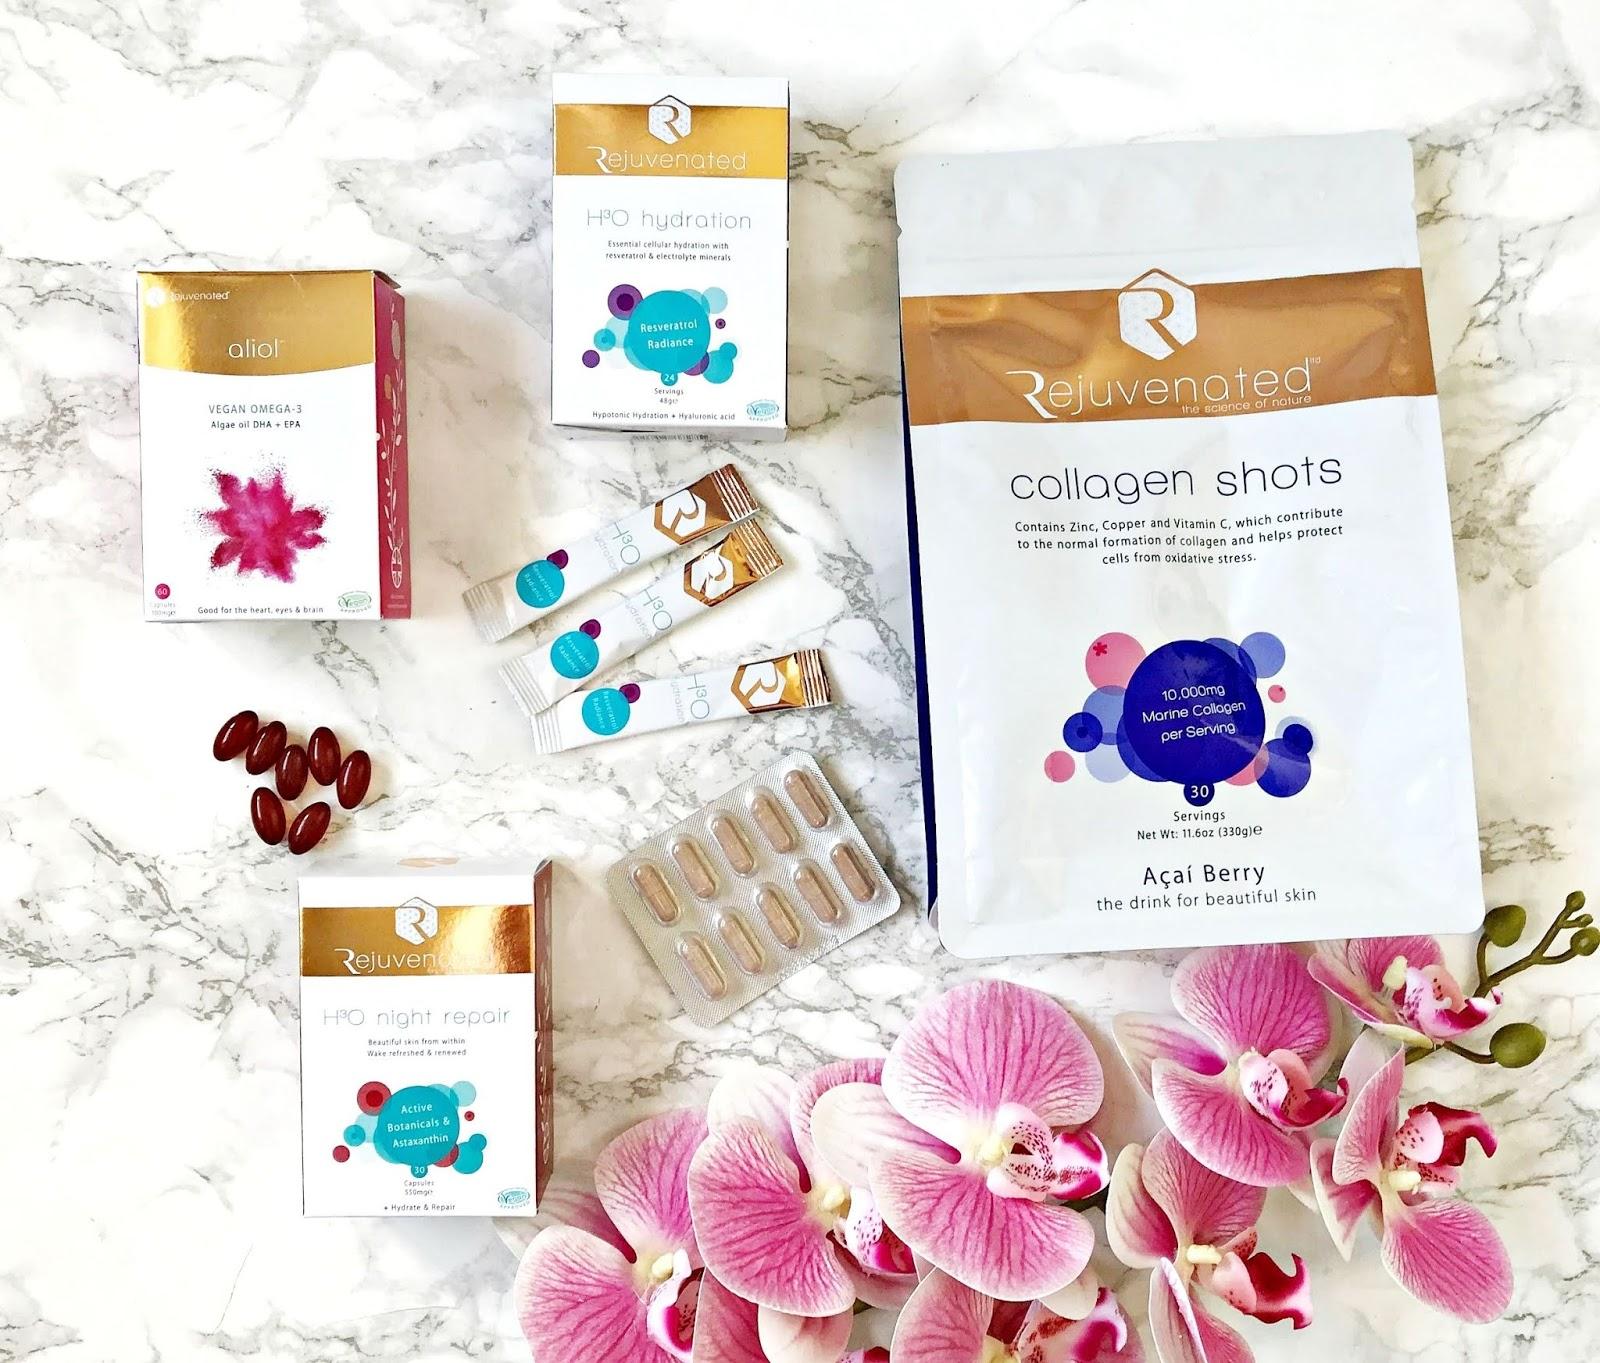 Aliol, Collagen Shots, Giveaway, H30 Hydration, H30 Night Repair, Rejuvenated, skincare, Supplements, Vegan Omega 3,